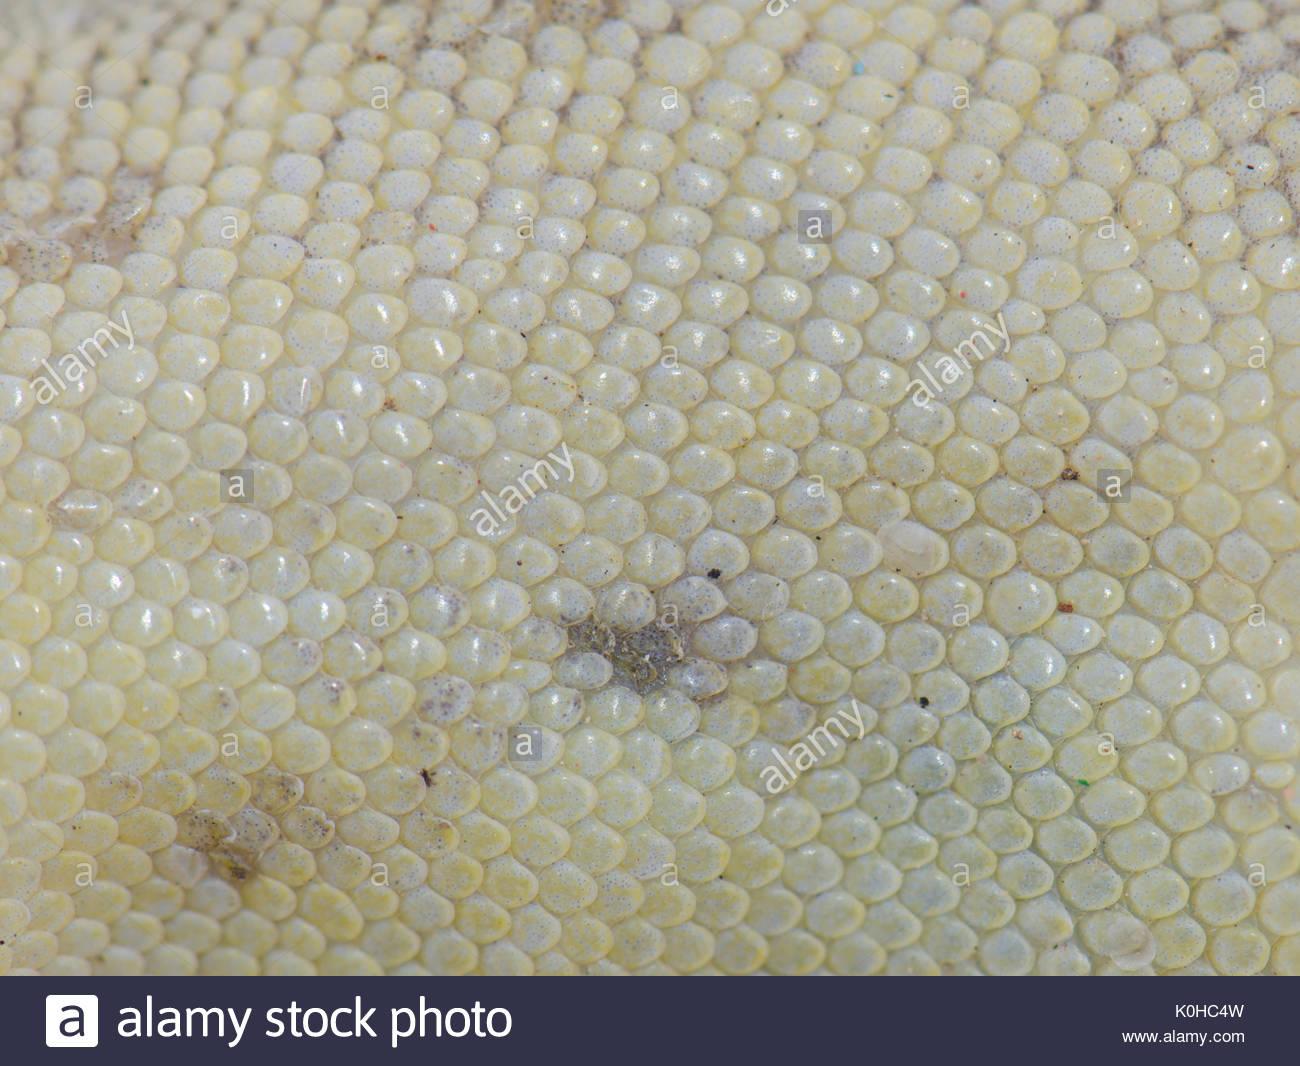 Detail of the scales (underside) of a Boettger's wall gecko (Tarentola boettgeri) killed by a dog. Schamann. Las Palmas de Gran Canaria. Gran Canaria. - Stock Image